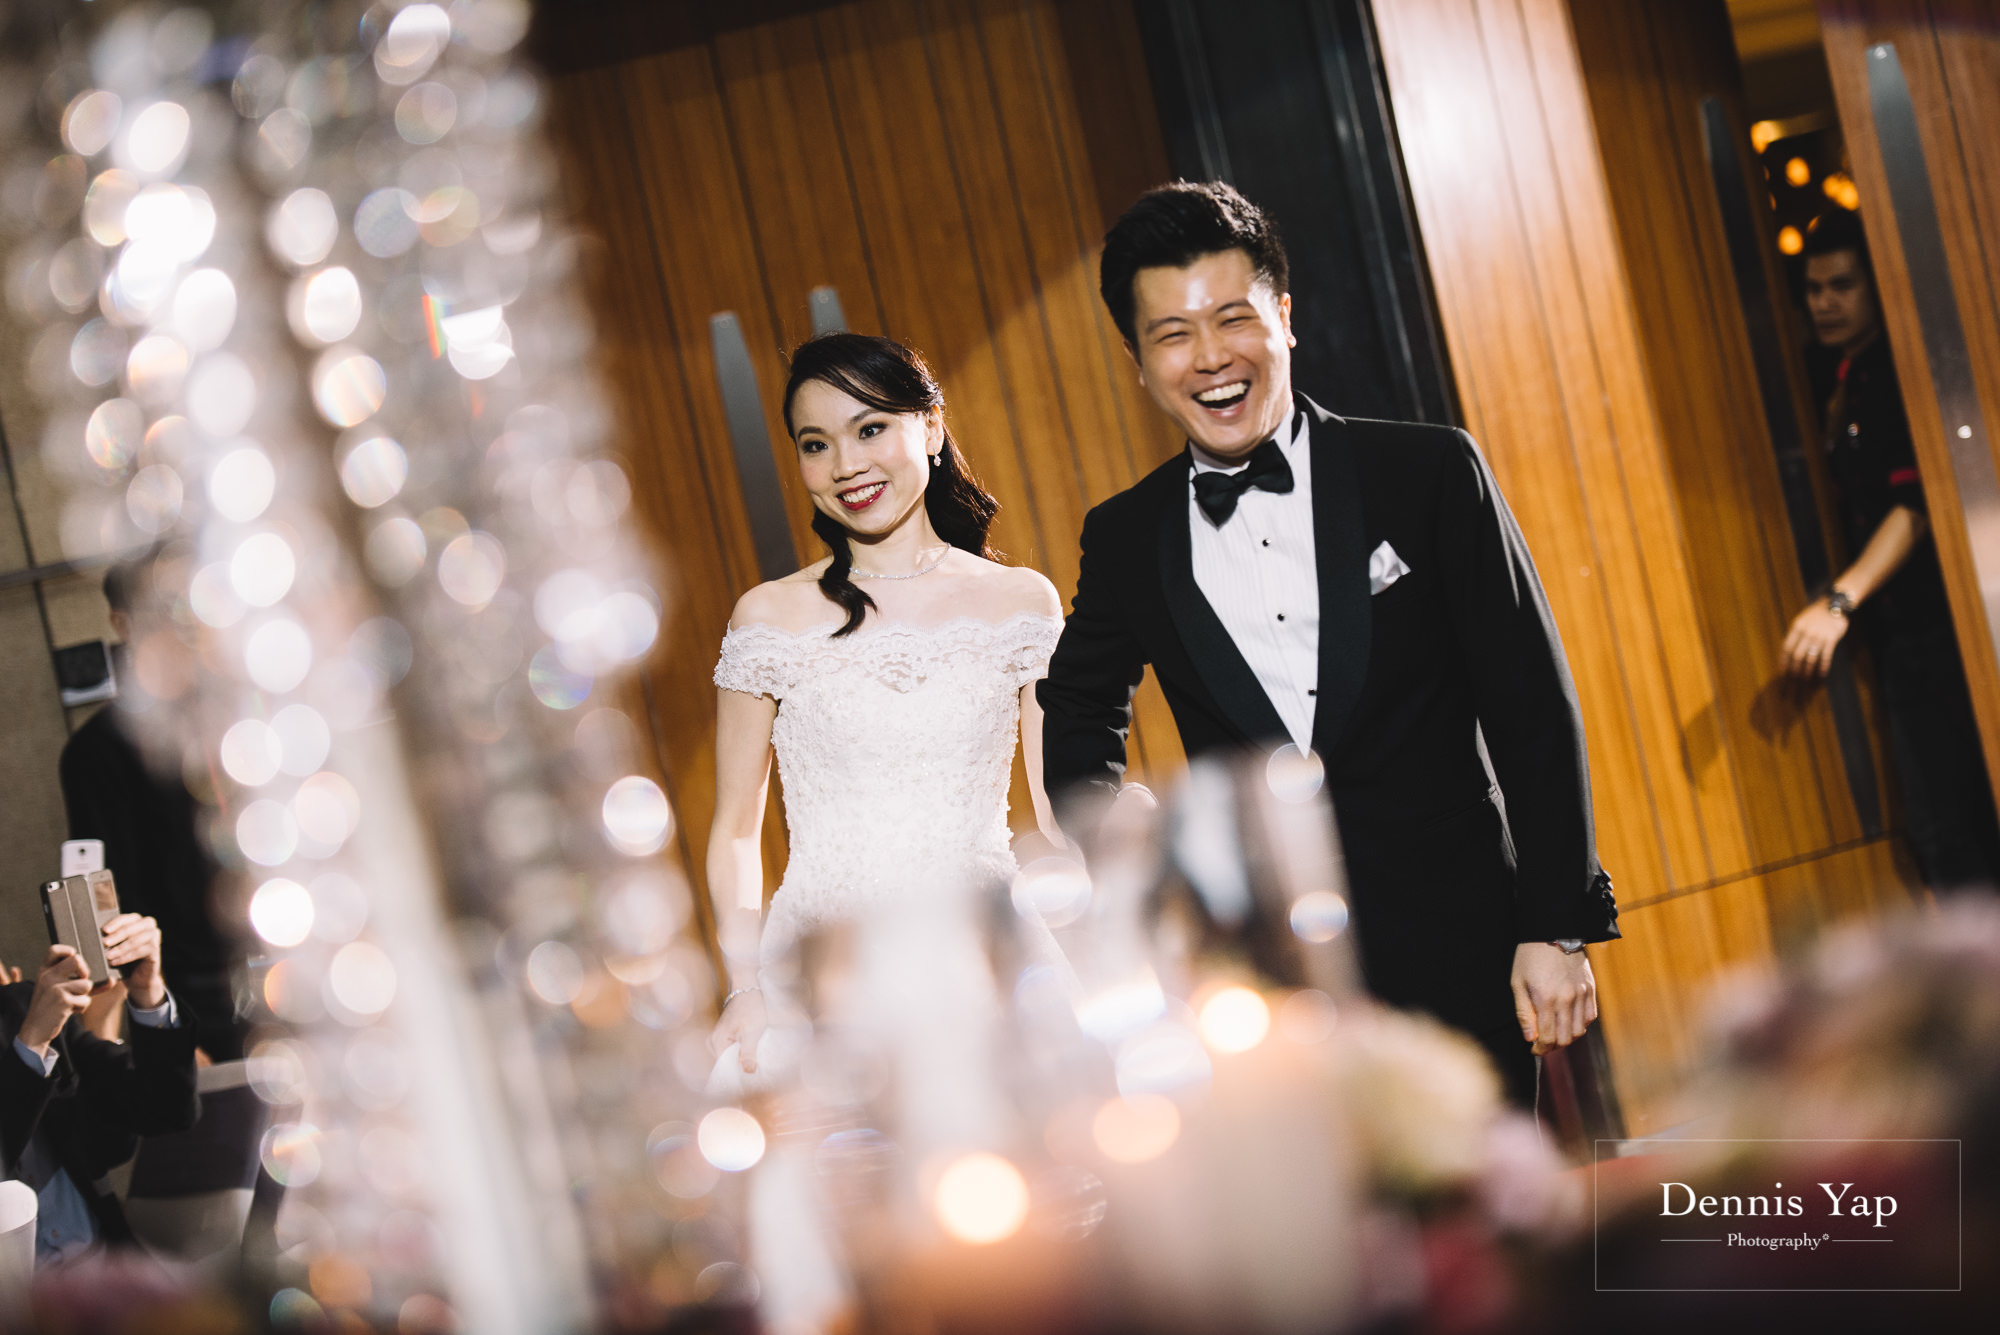 han sen ce pei wedding day A loft hotel kuala lumpur dennis yap photography-21.jpg